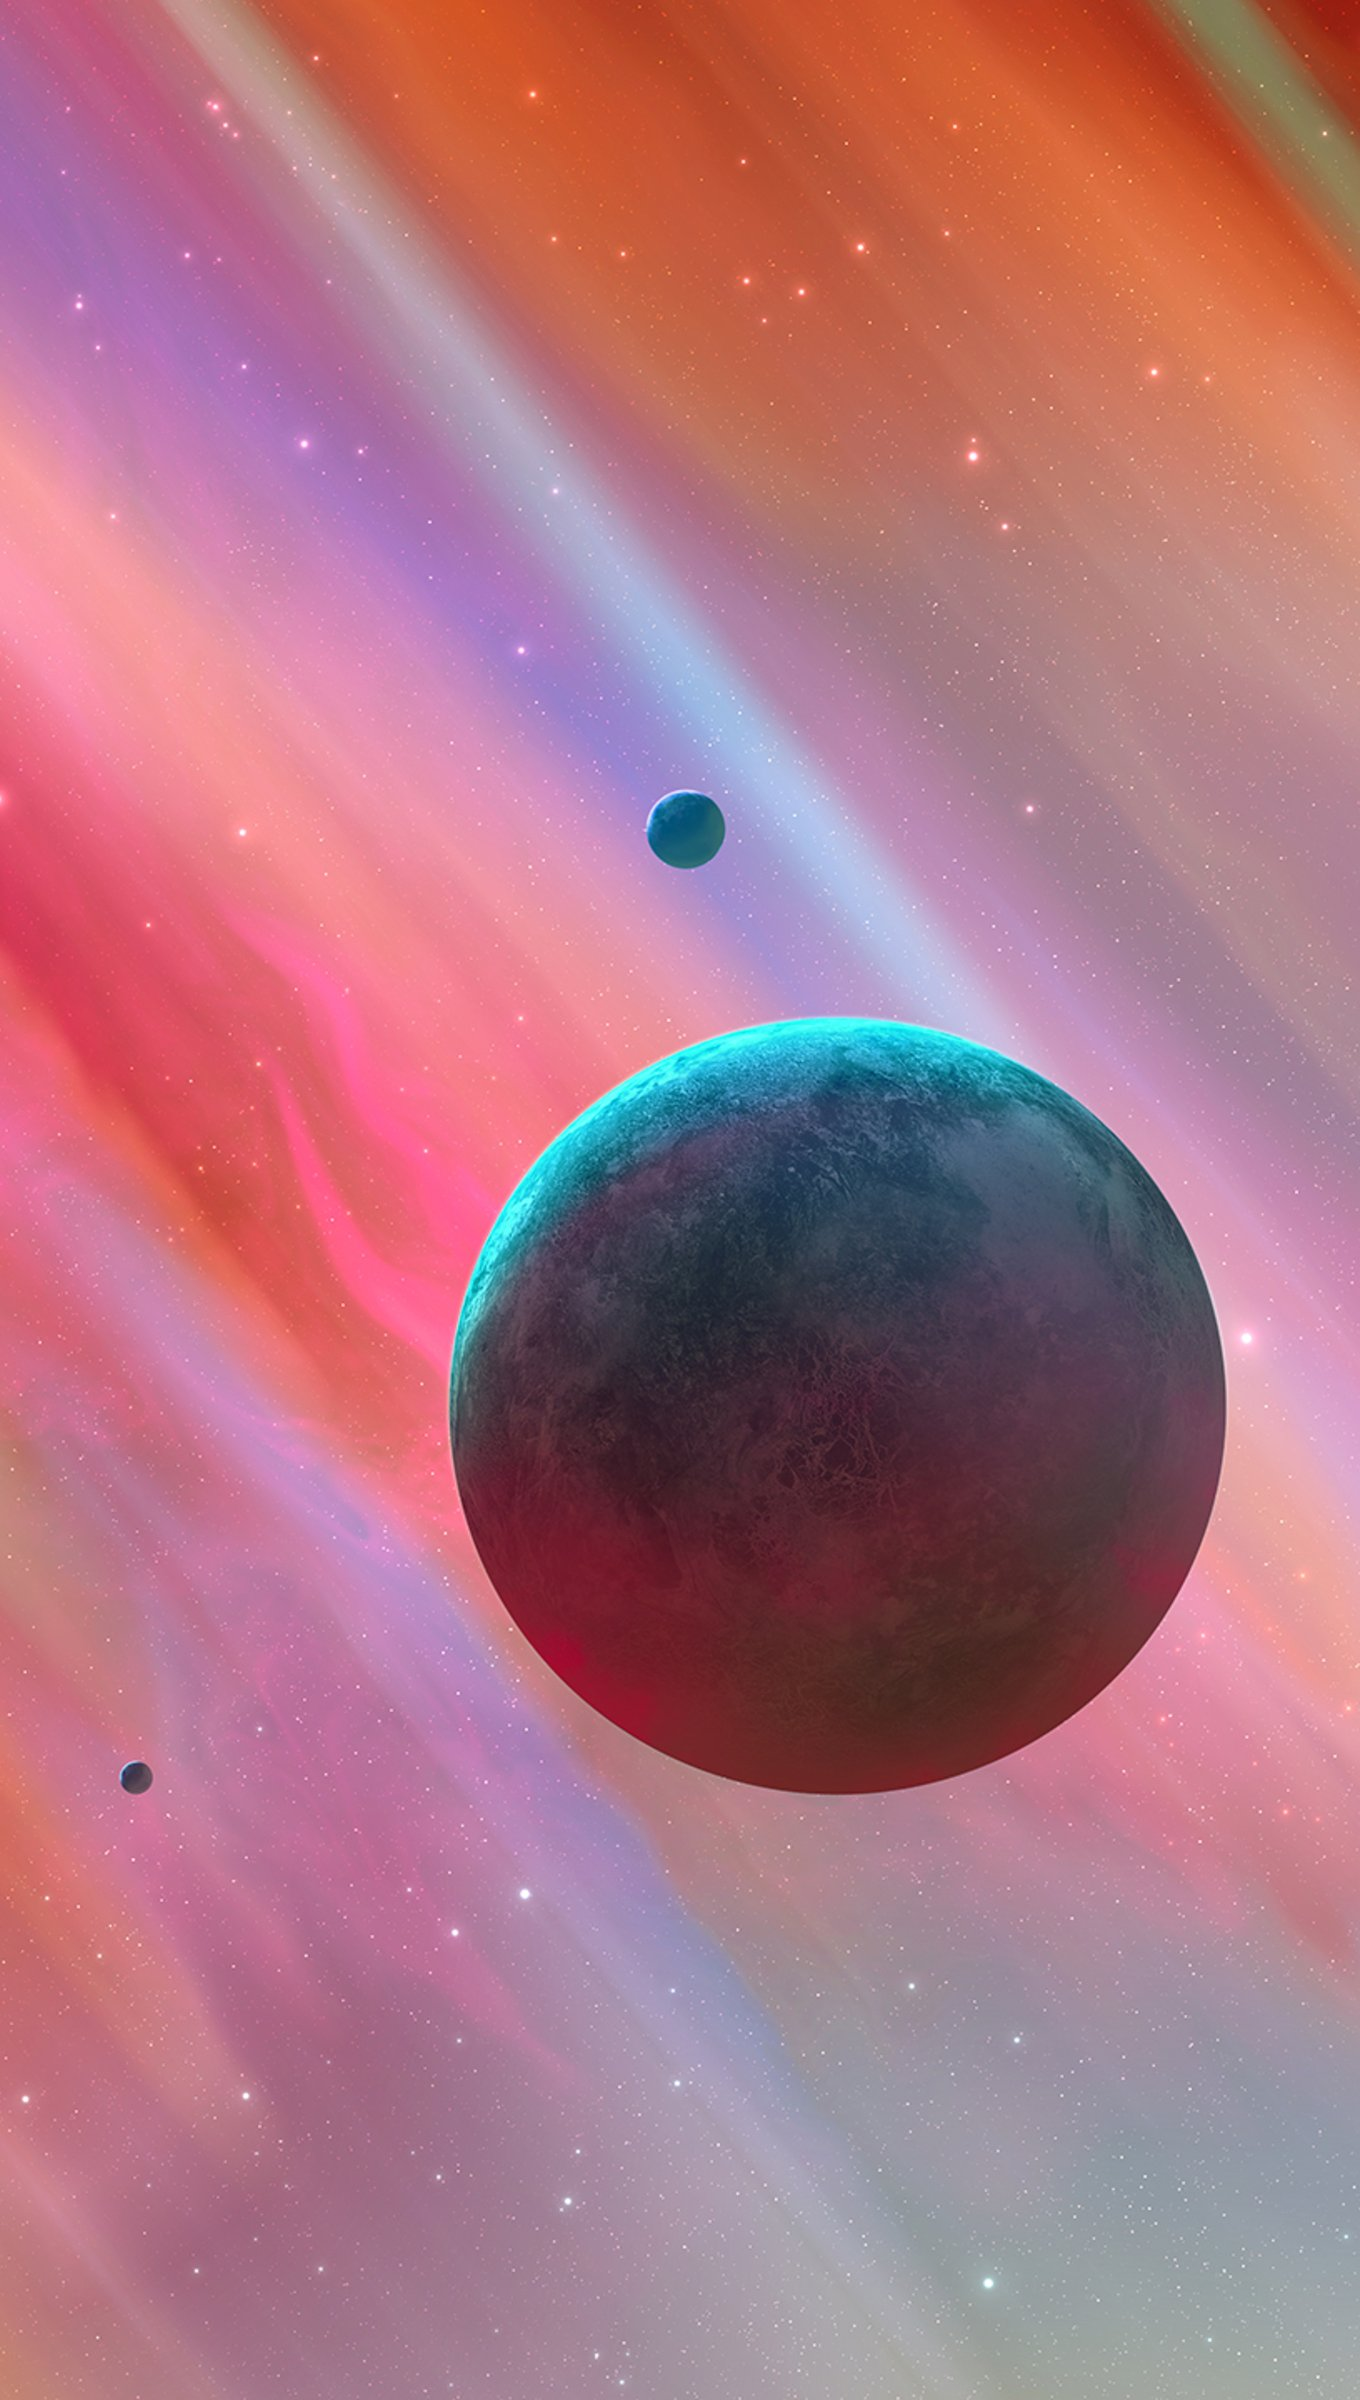 Fondos de pantalla Universo de colores Vertical